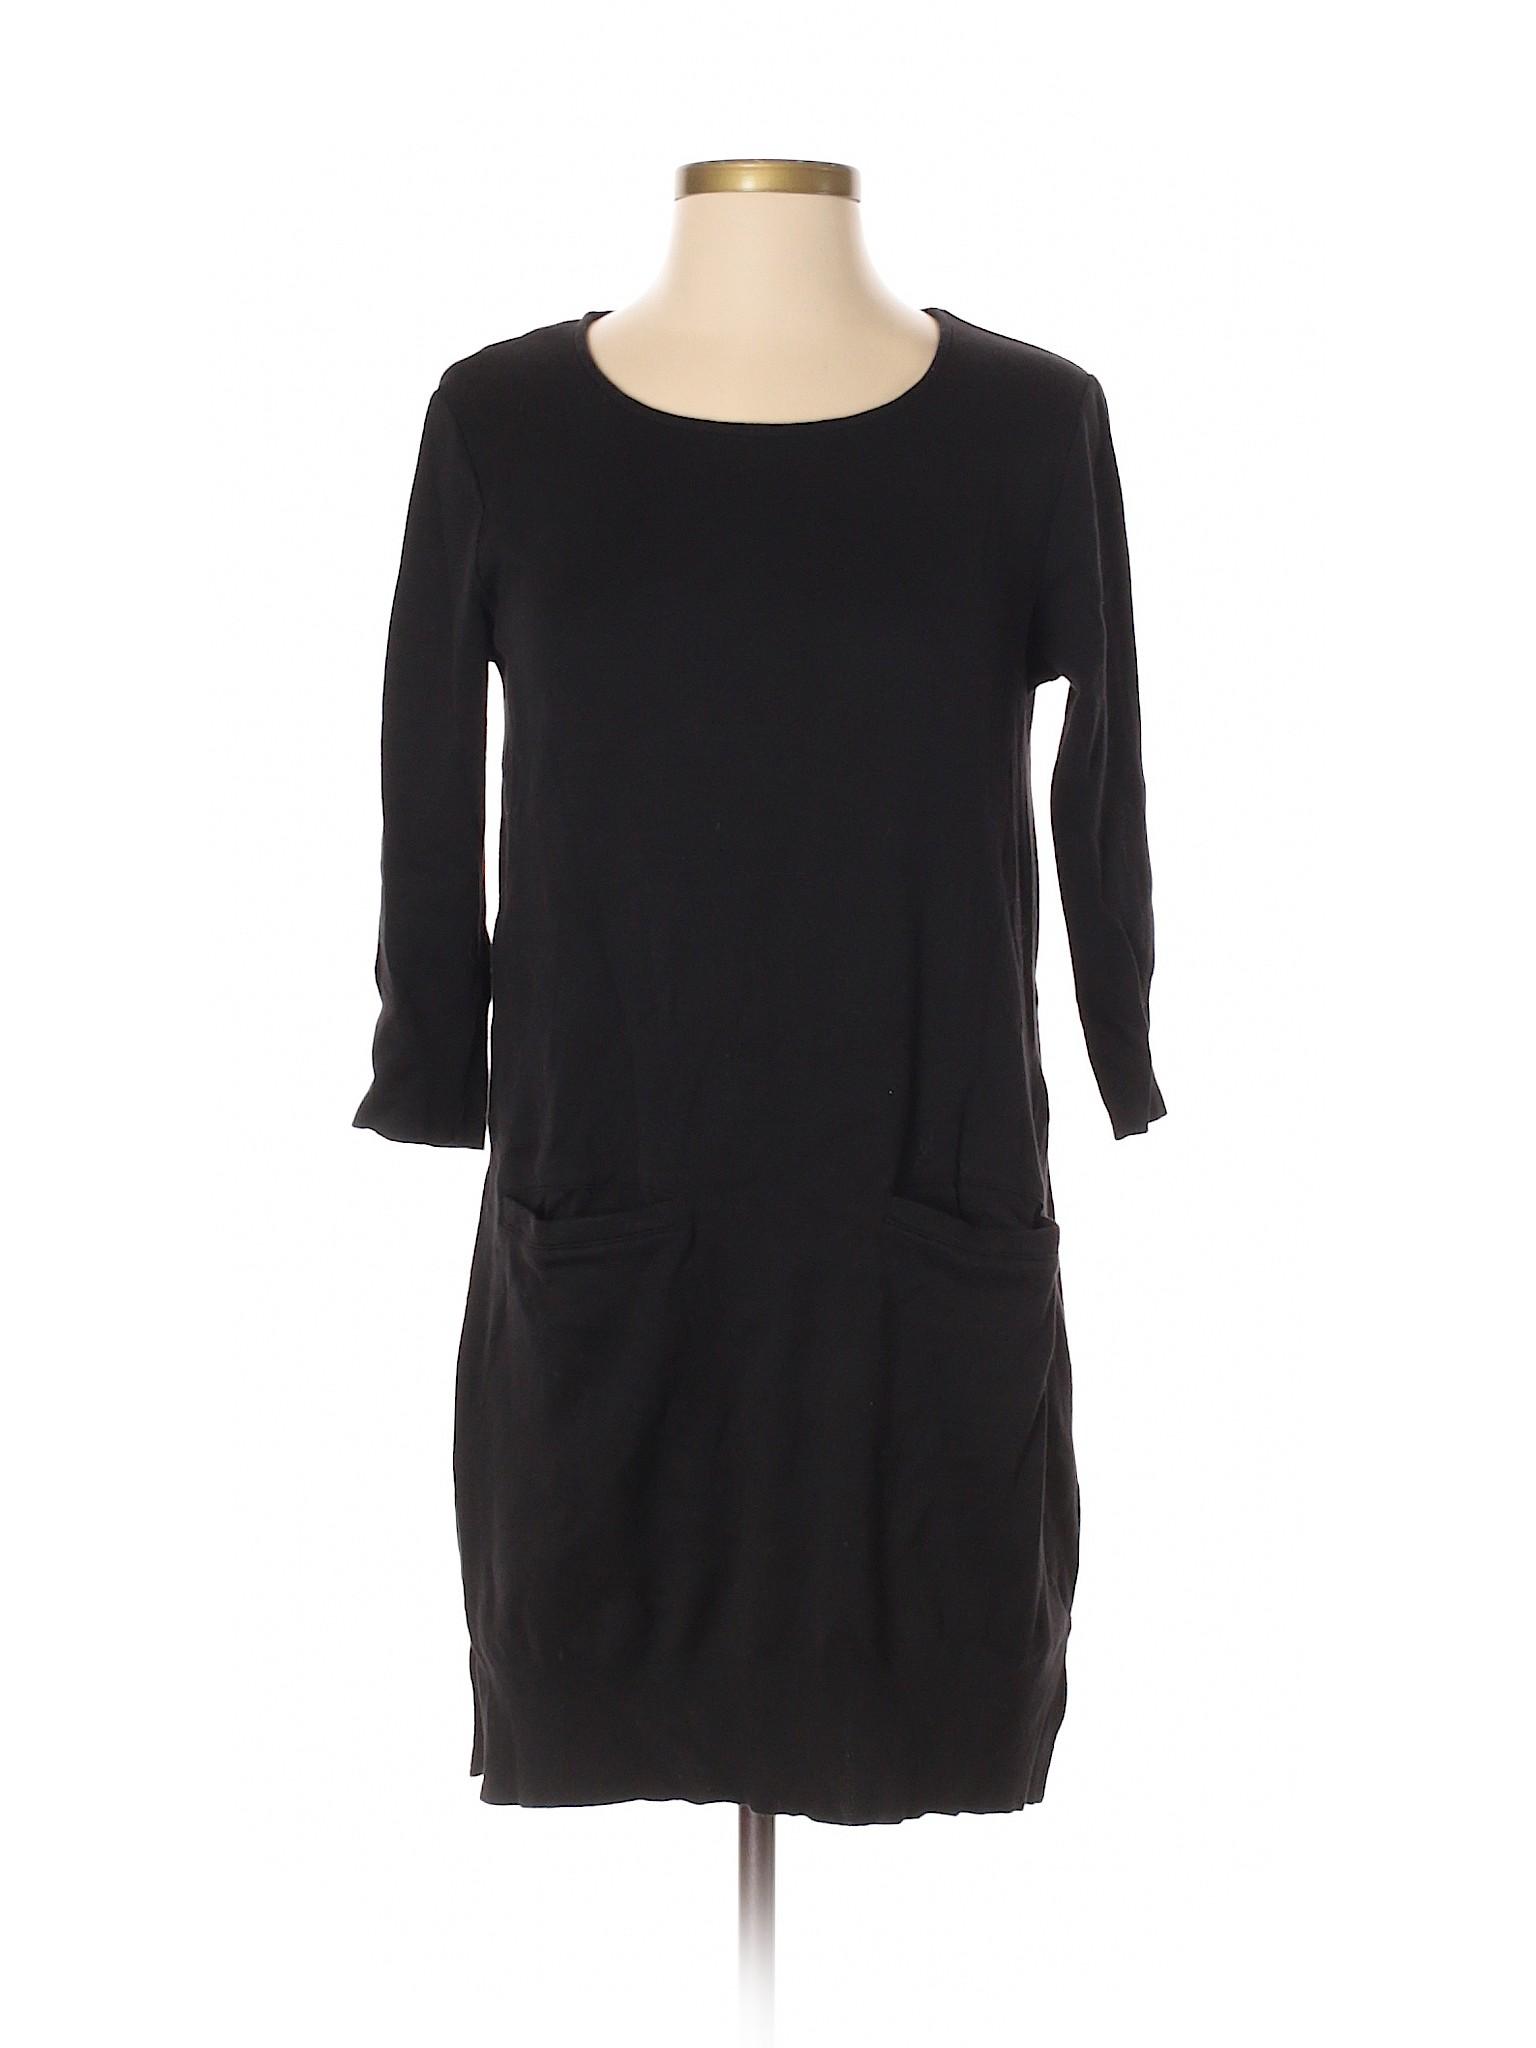 Vass Joan Casual Boutique Dress winter 0Tq1wnRx